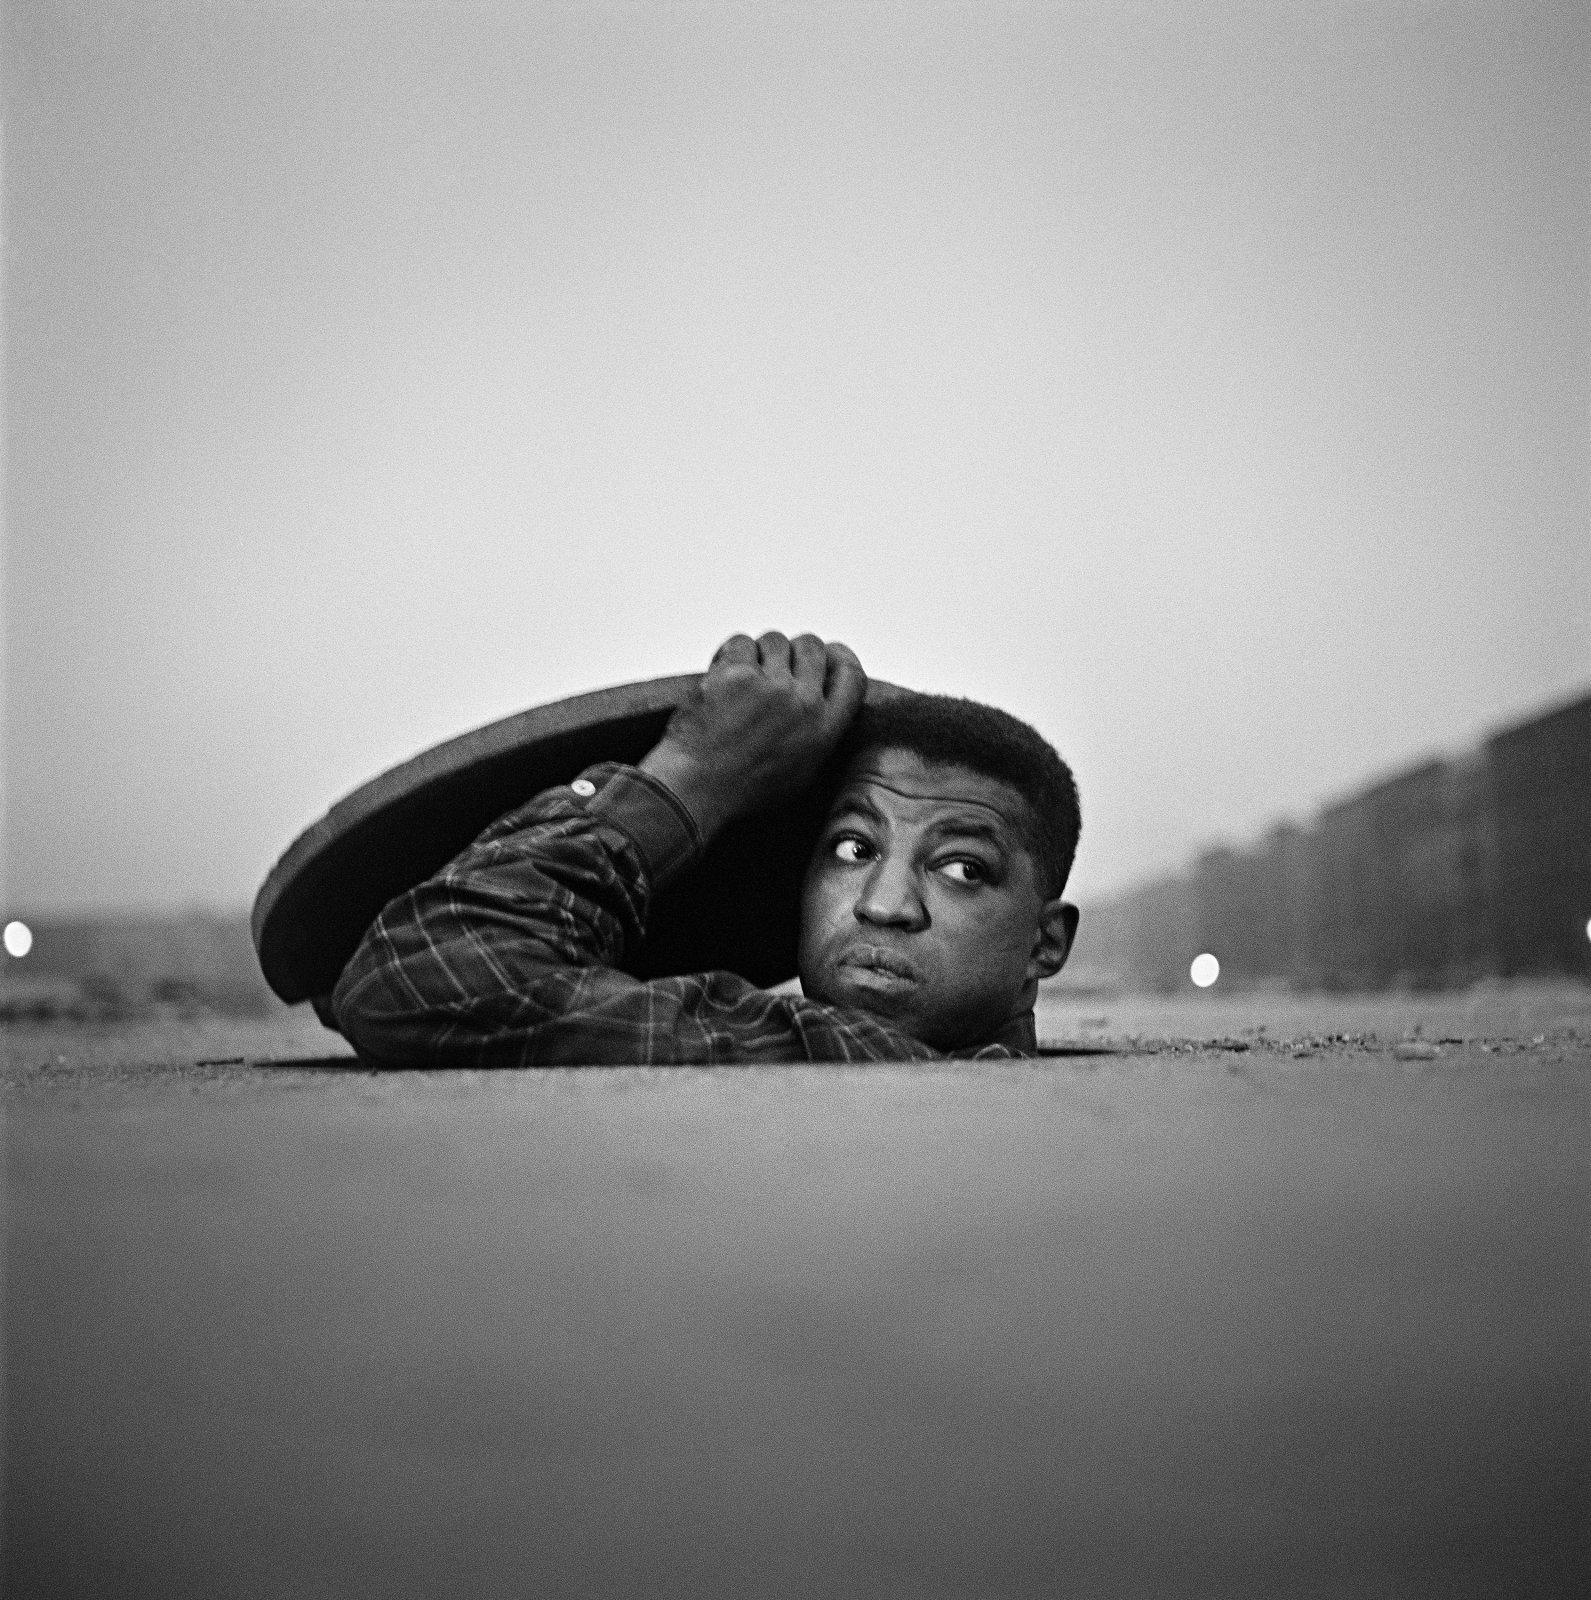 The invisible man, Harlem NEW YORK, 1952, Gordon Parks